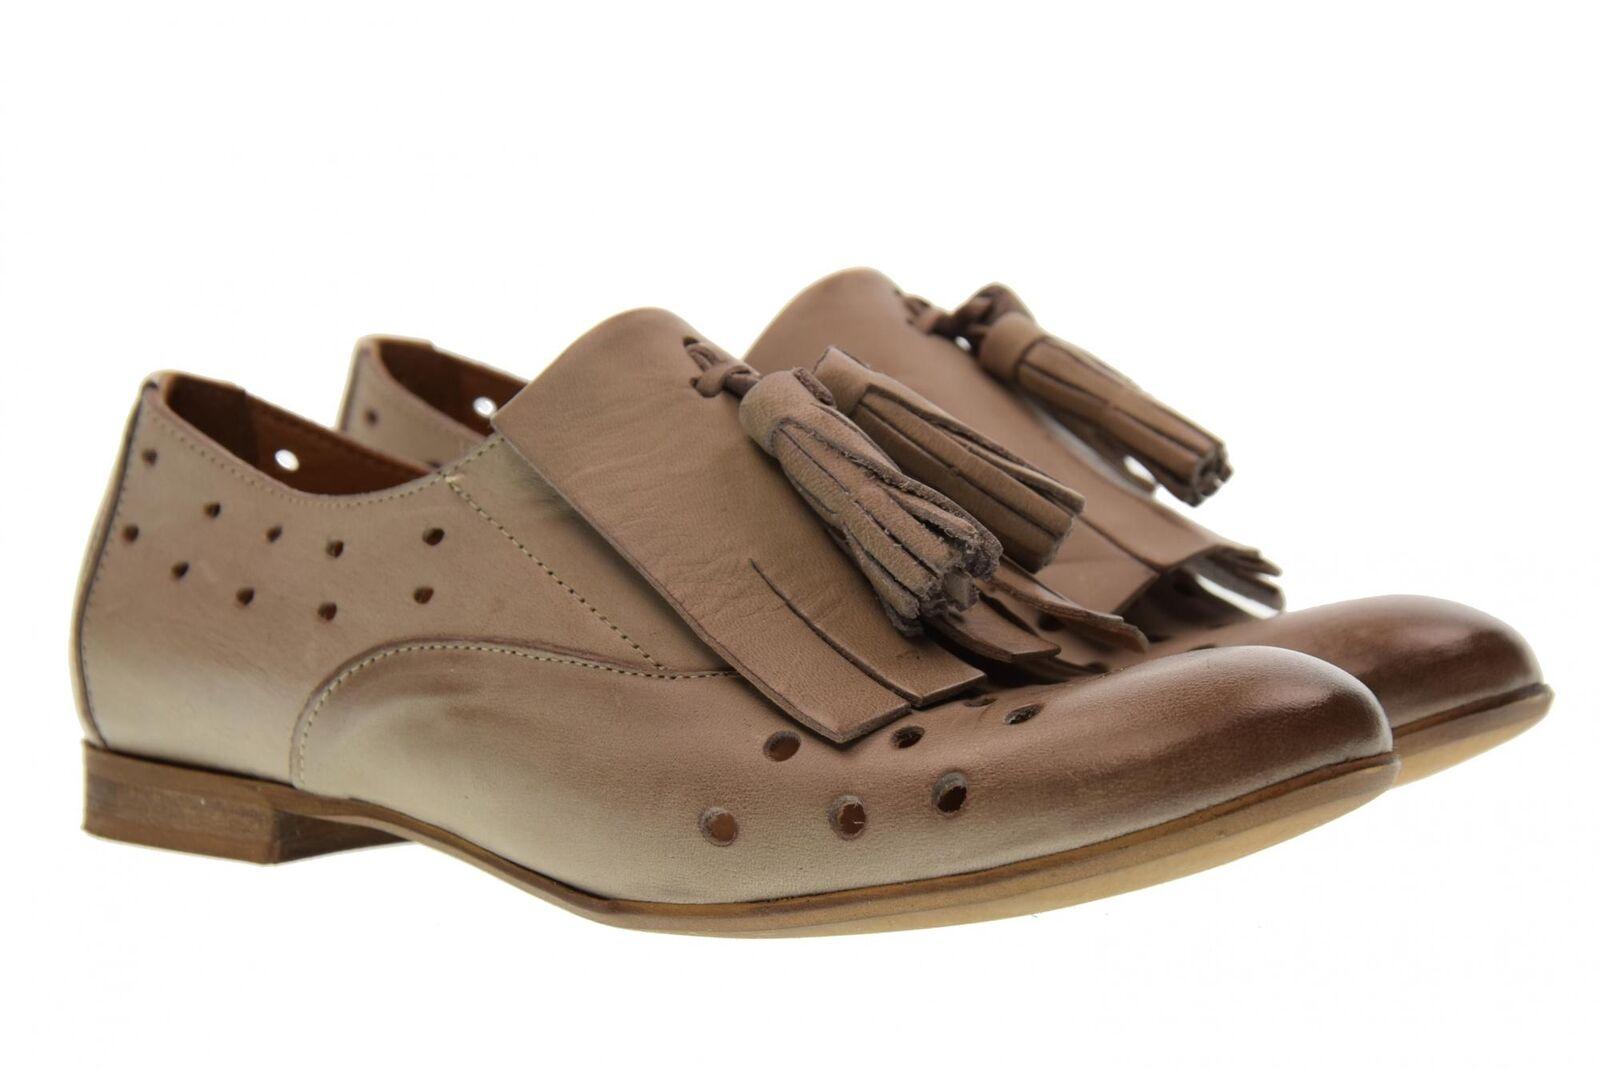 Erman's scarpe donna mocassino 230 TORTORA P18